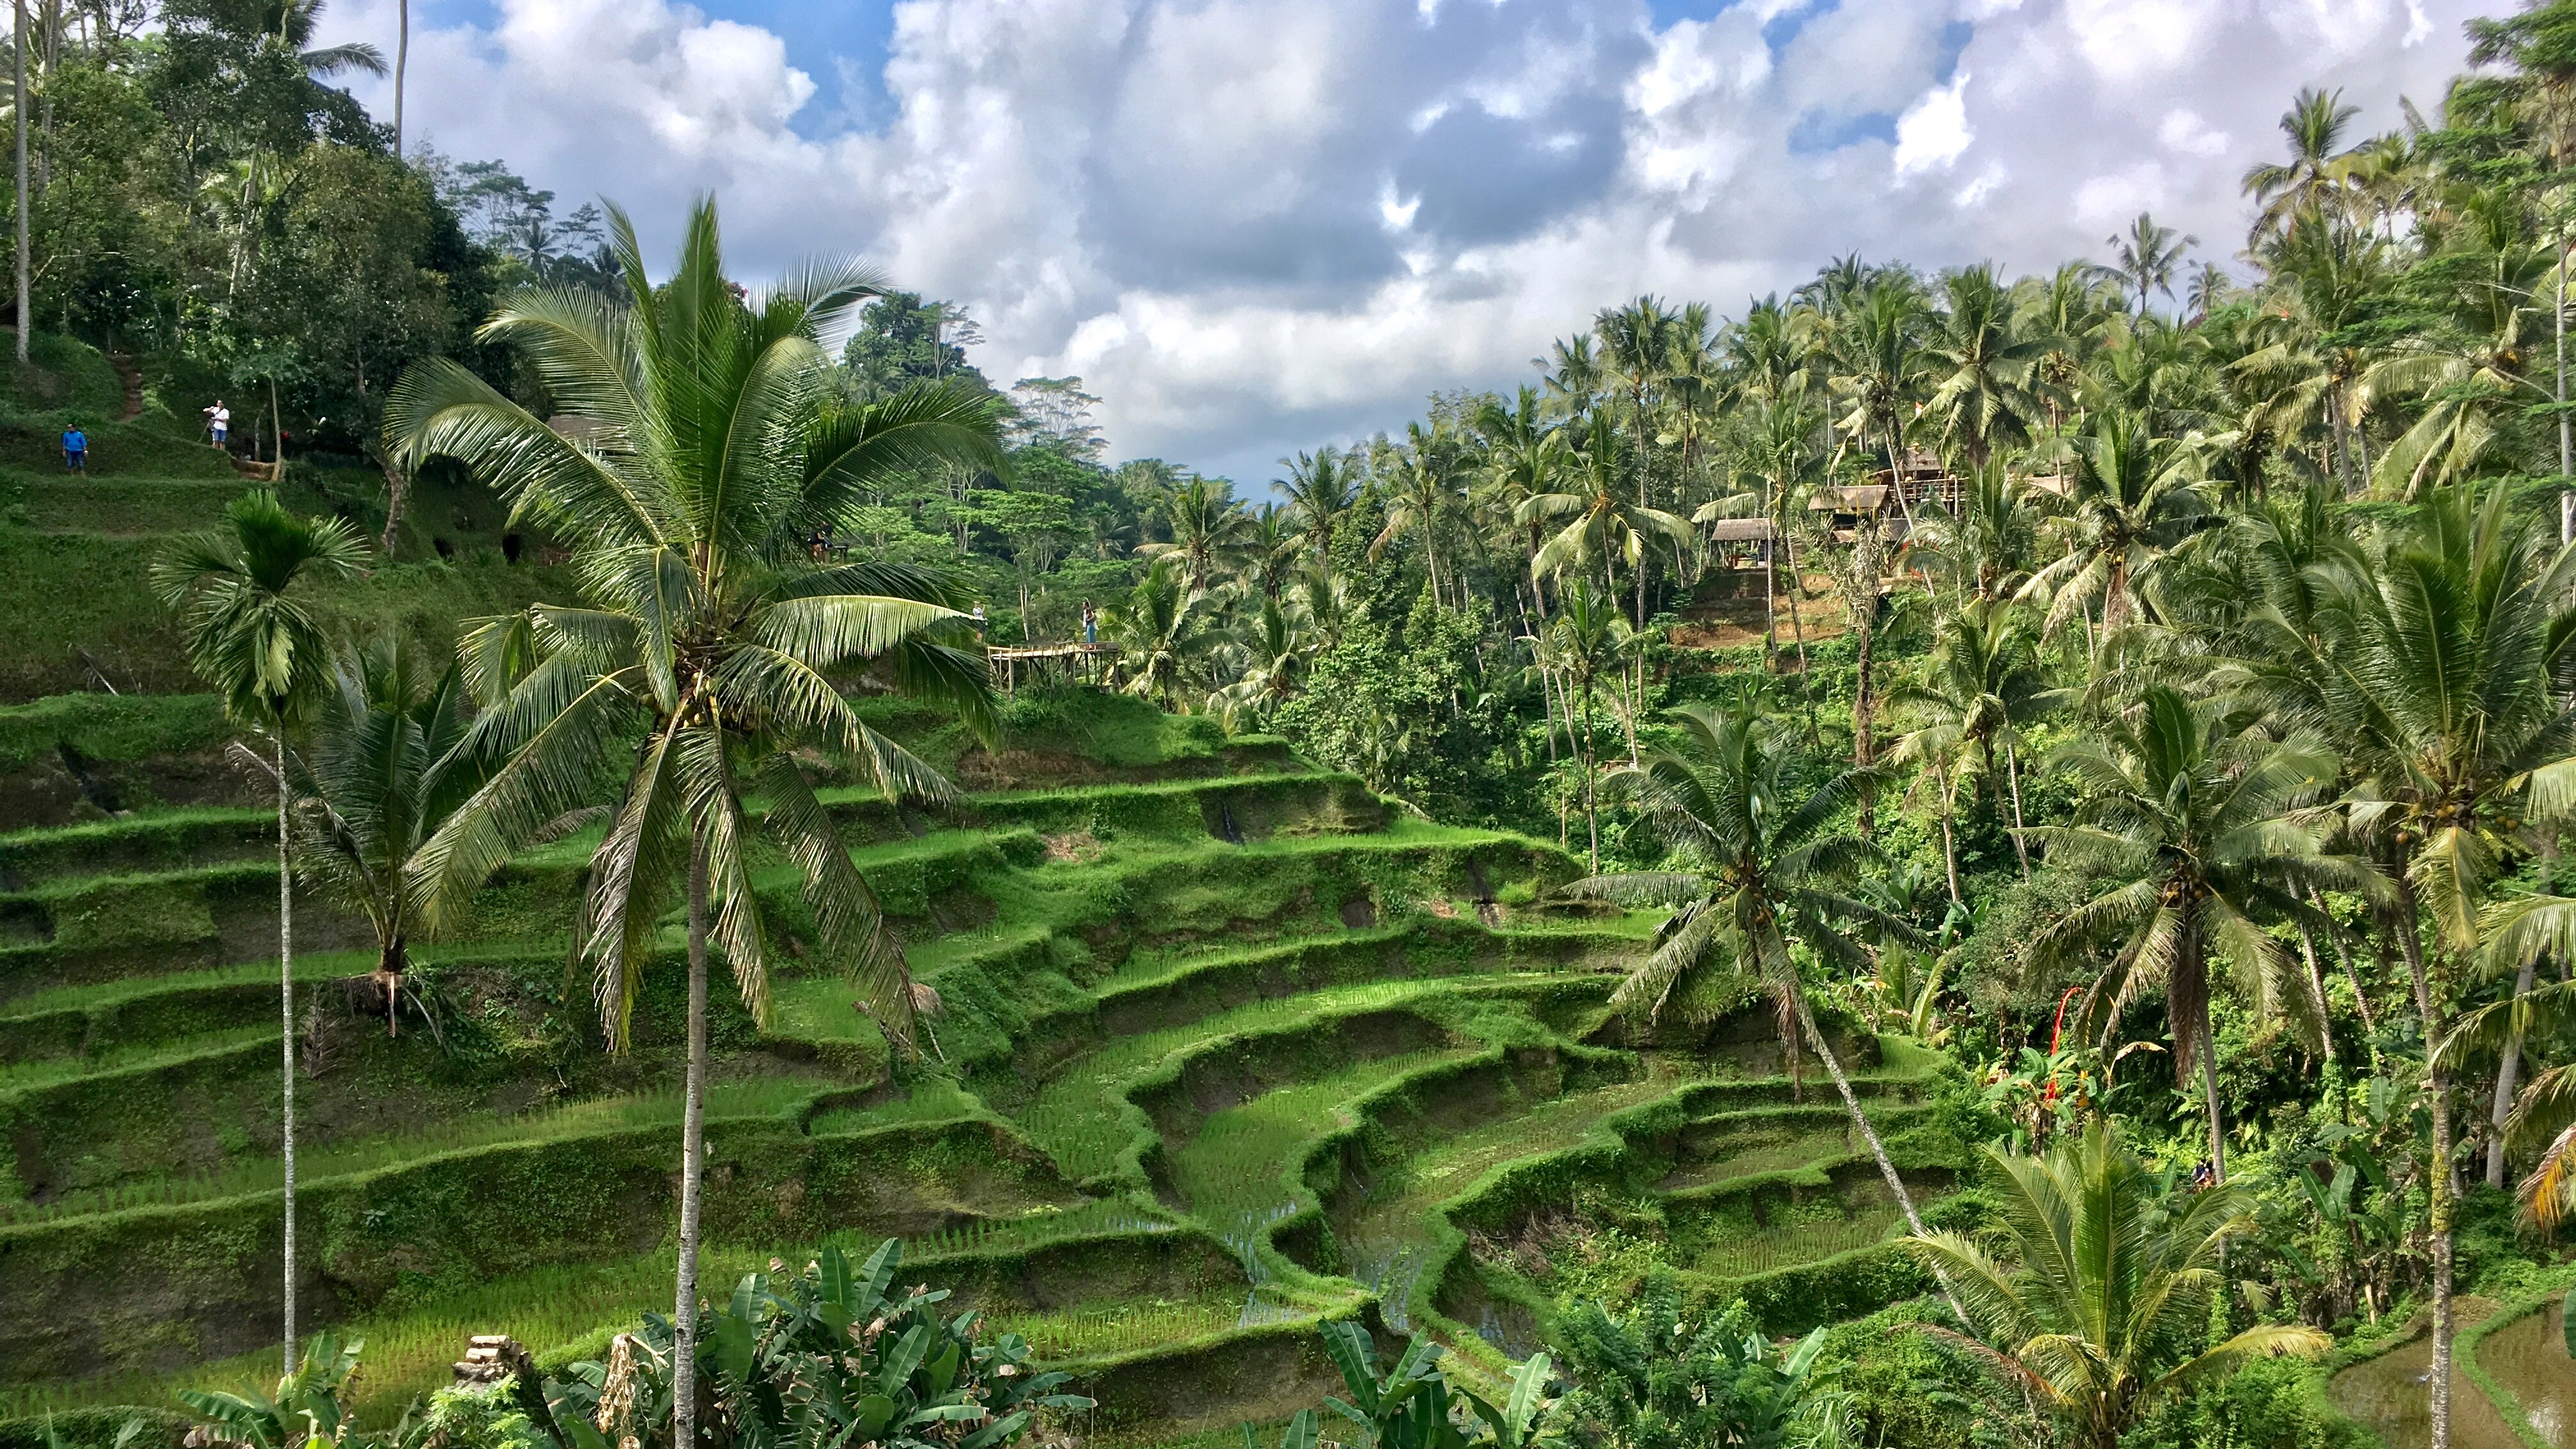 Tegalalang Rice Terrace, Ubud, Bali, Indonesia